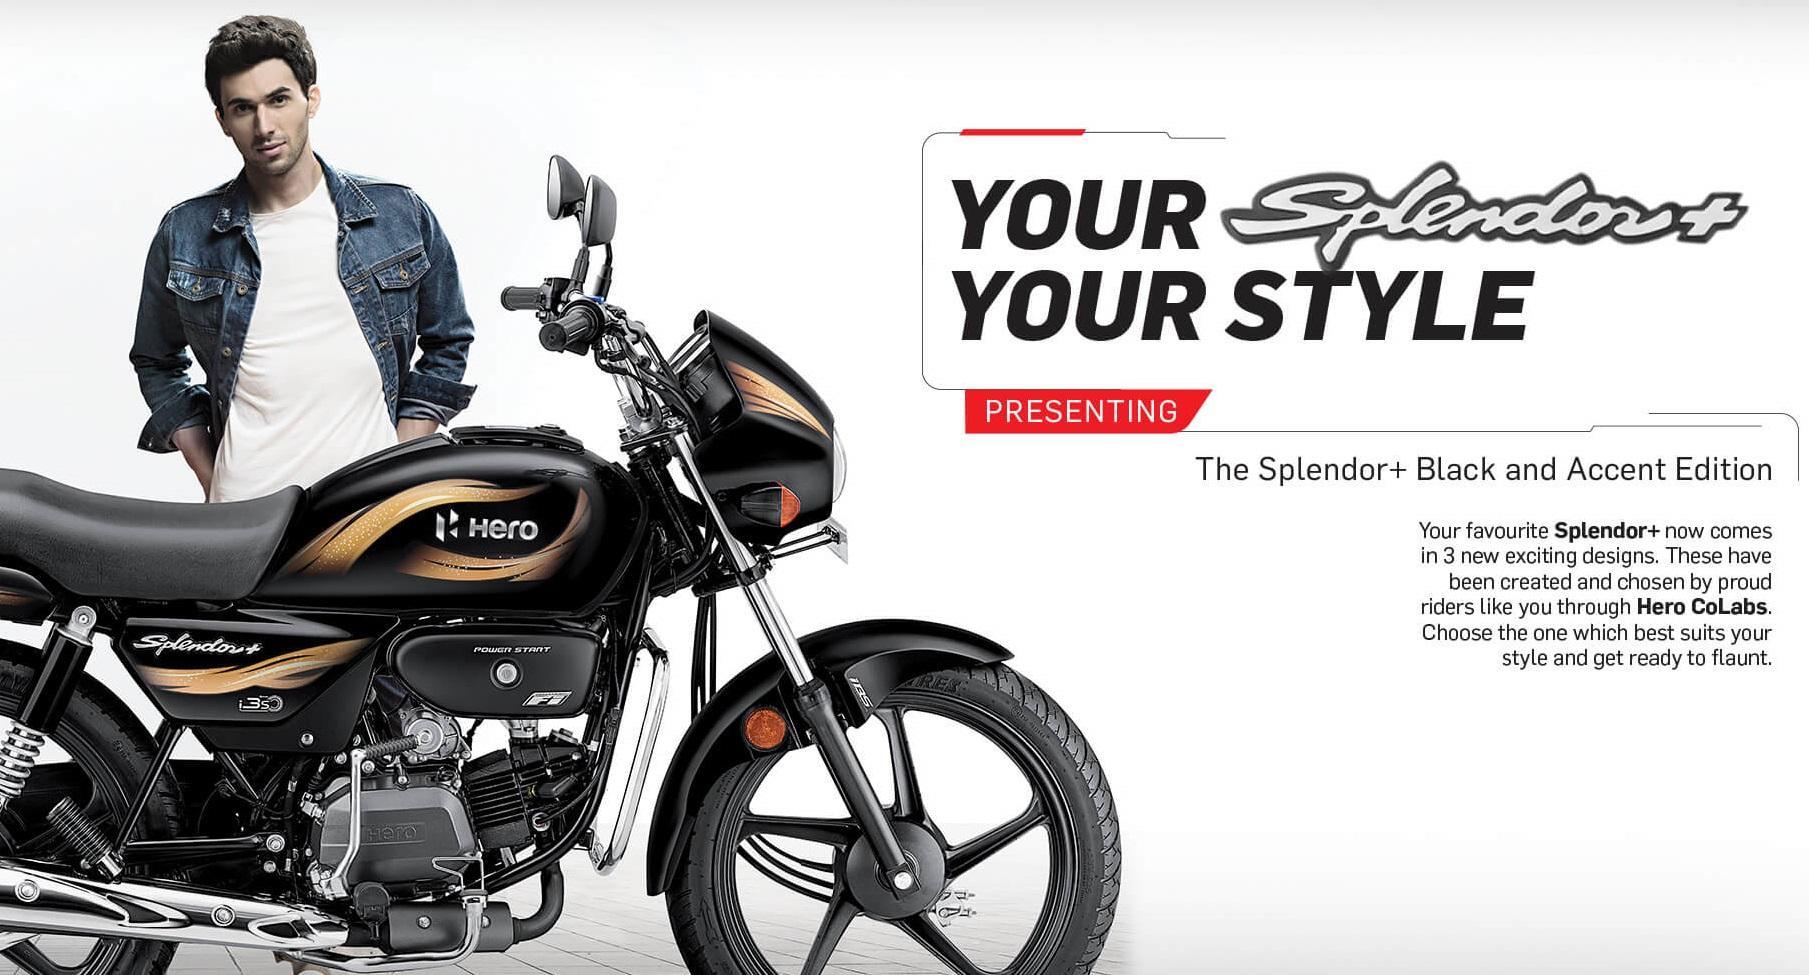 Which bike is the best - Bajaj Pulsar 125 vs Hero Splendor Plus?